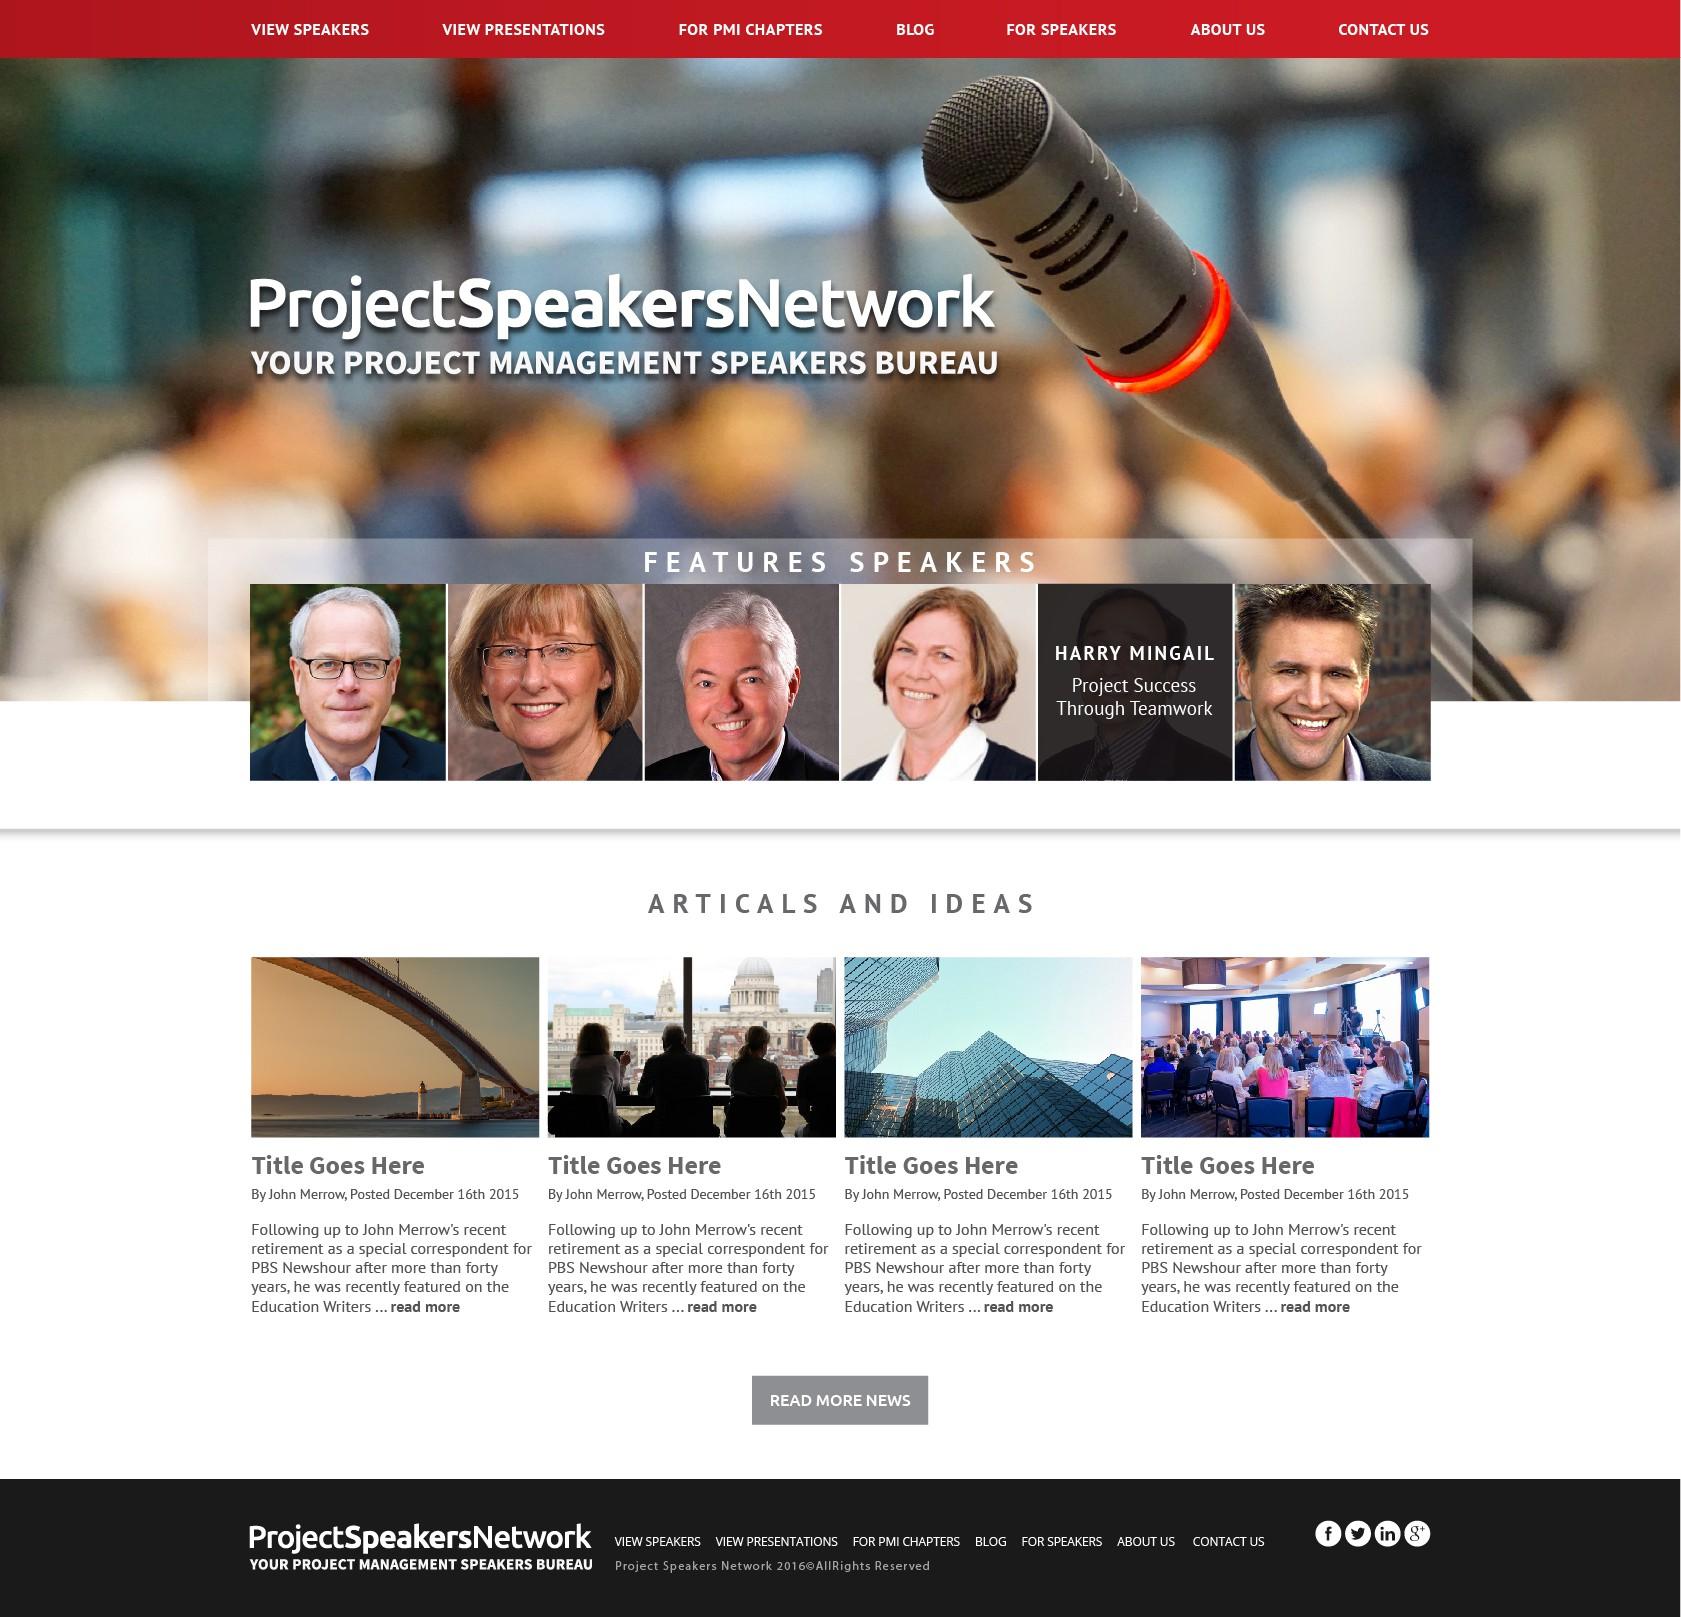 ProjectSpeakersNetwork